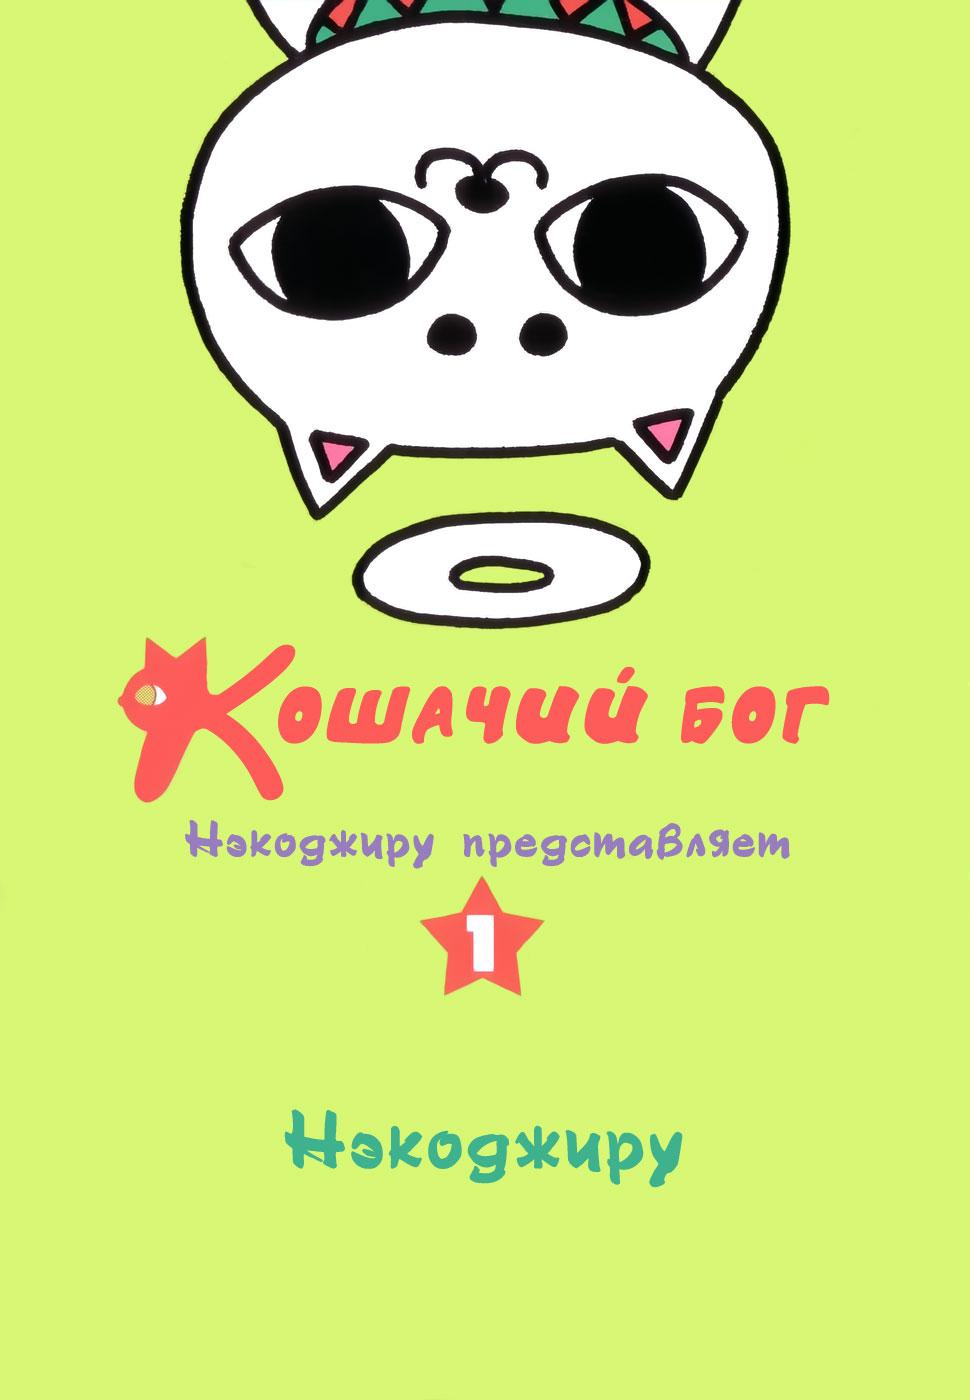 https://r1.ninemanga.com/comics/pic2/43/34923/654111/1538725874898.jpg Page 1